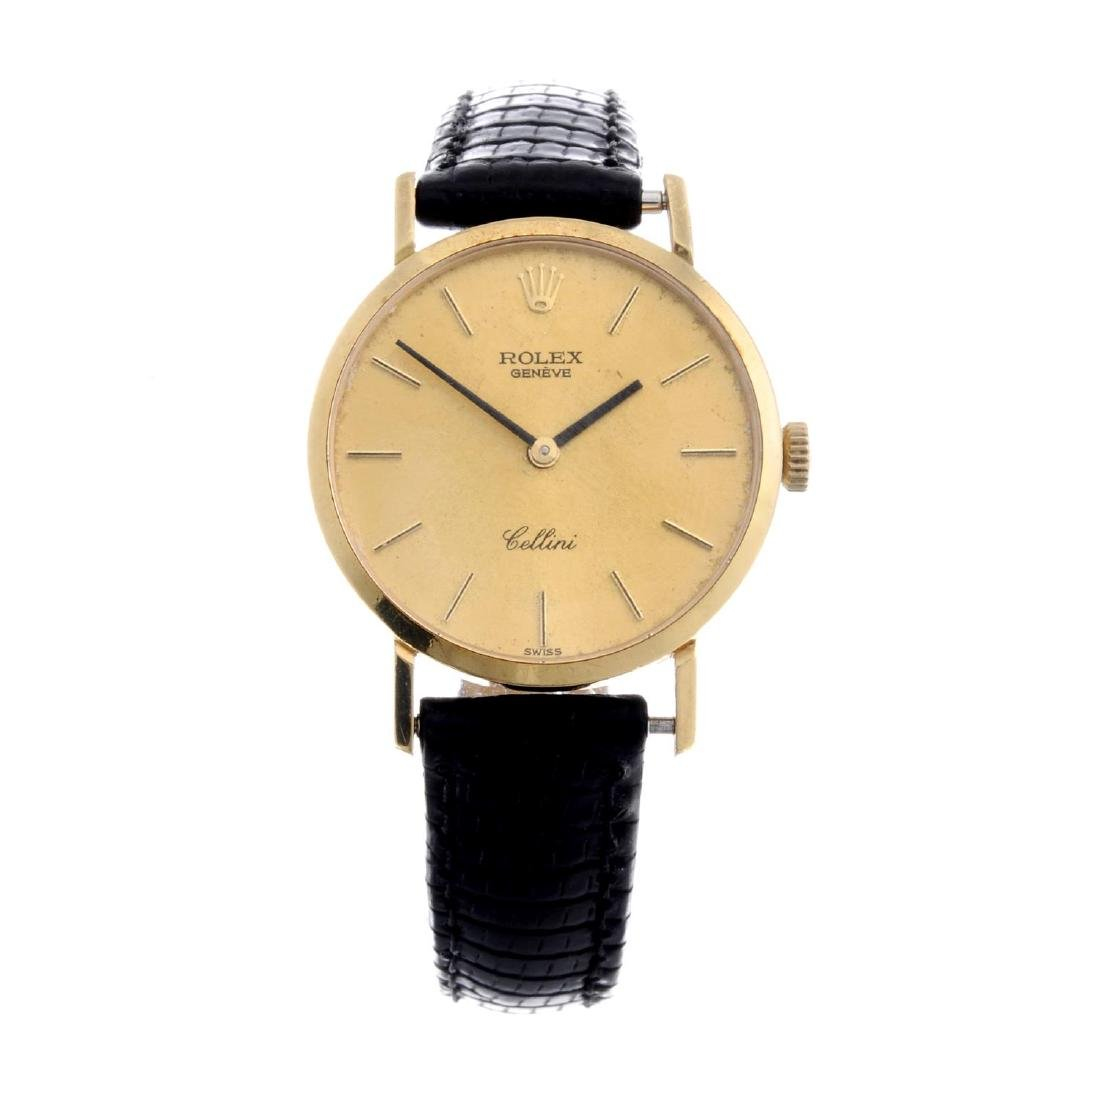 ROLEX - a lady's Cellini wrist watch. Circa 1976.